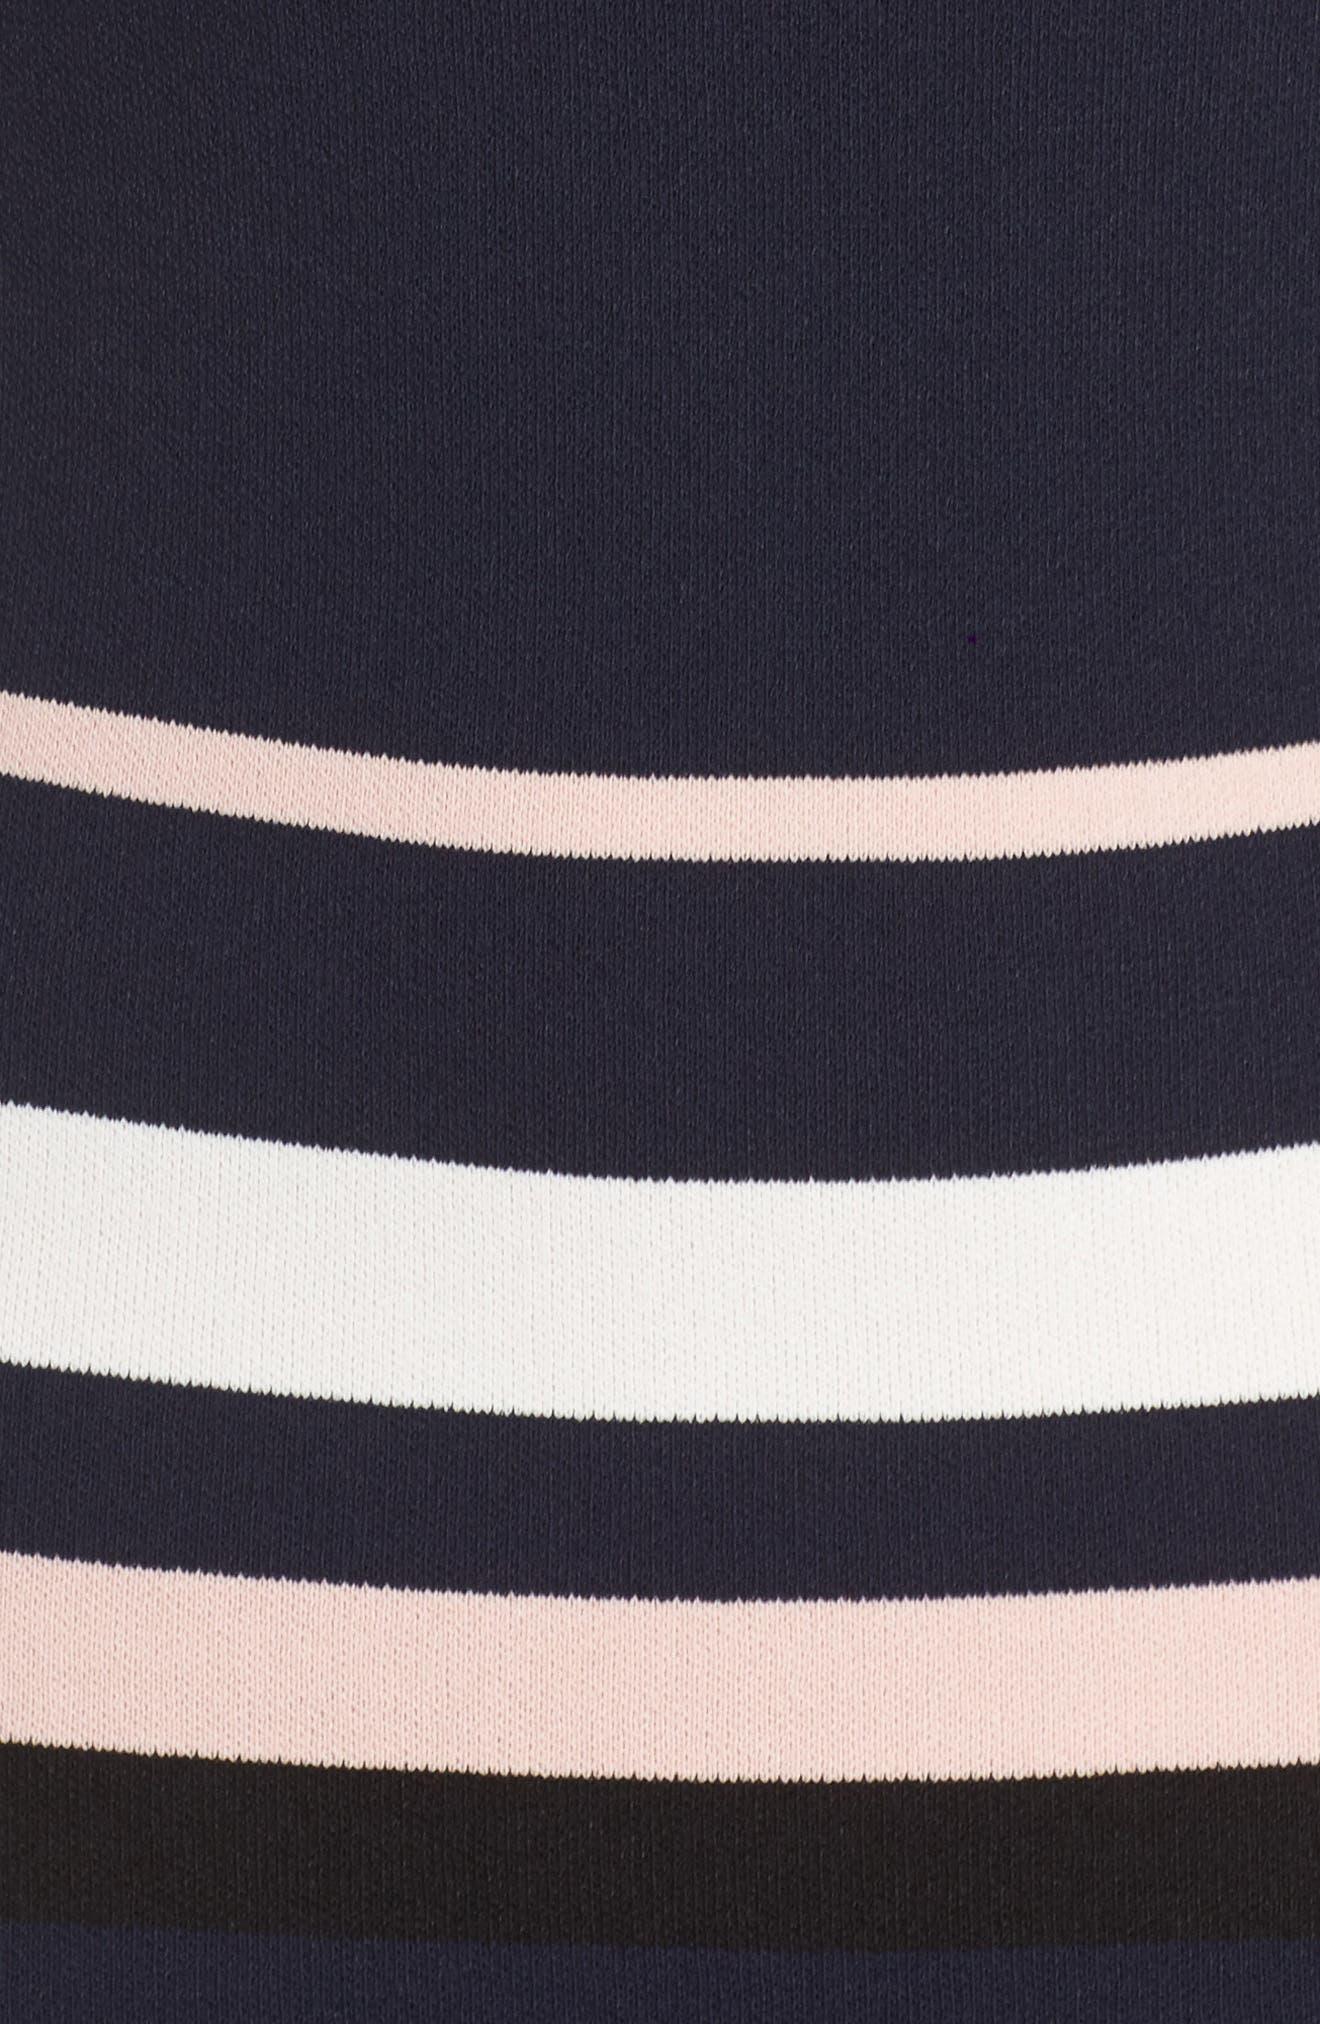 Stripe Sweater Dress,                             Alternate thumbnail 5, color,                             498